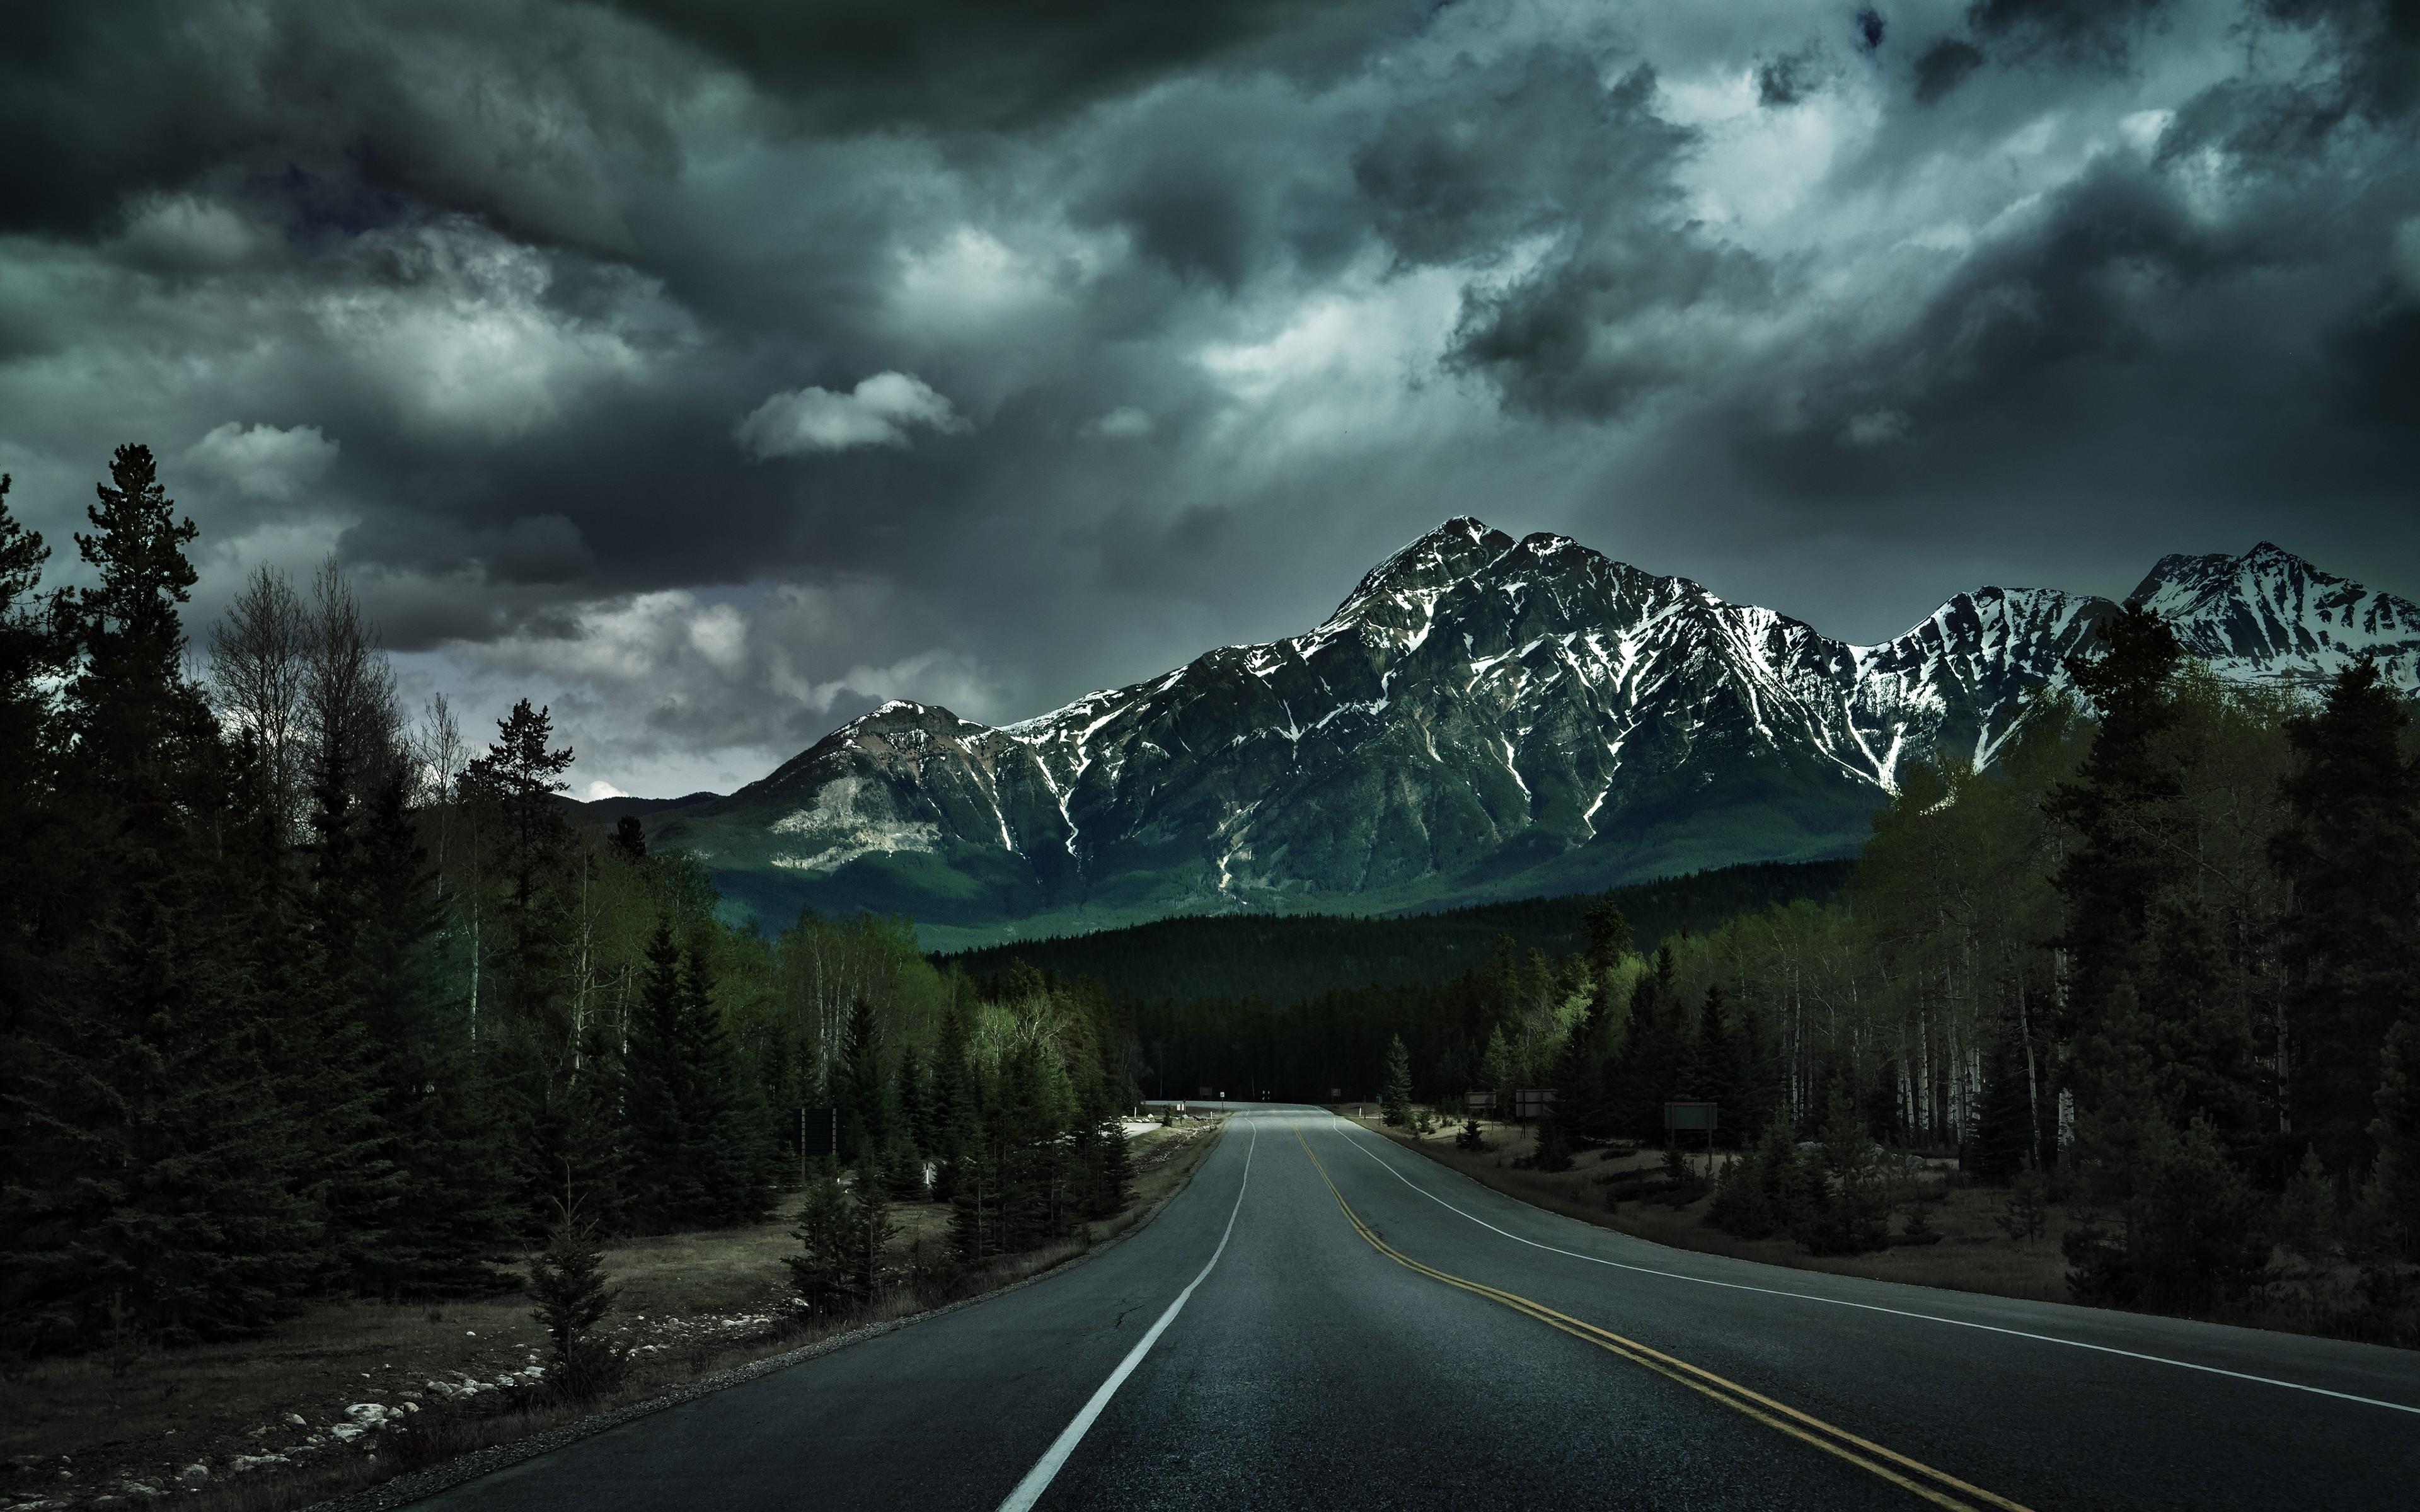 Wallpaper : 3840x2400 px, landscape, mountain, road ...